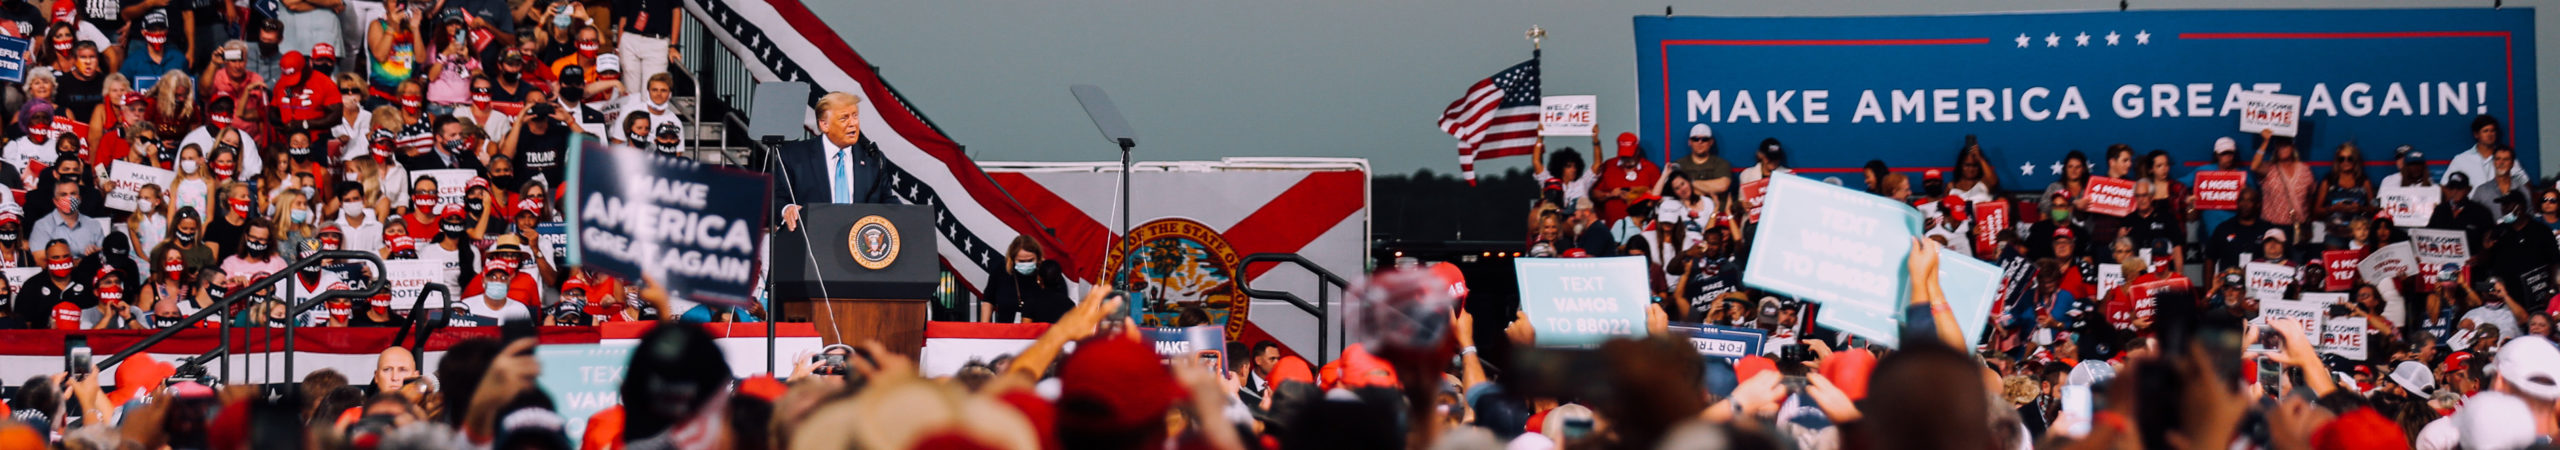 Trump Rally in Jax